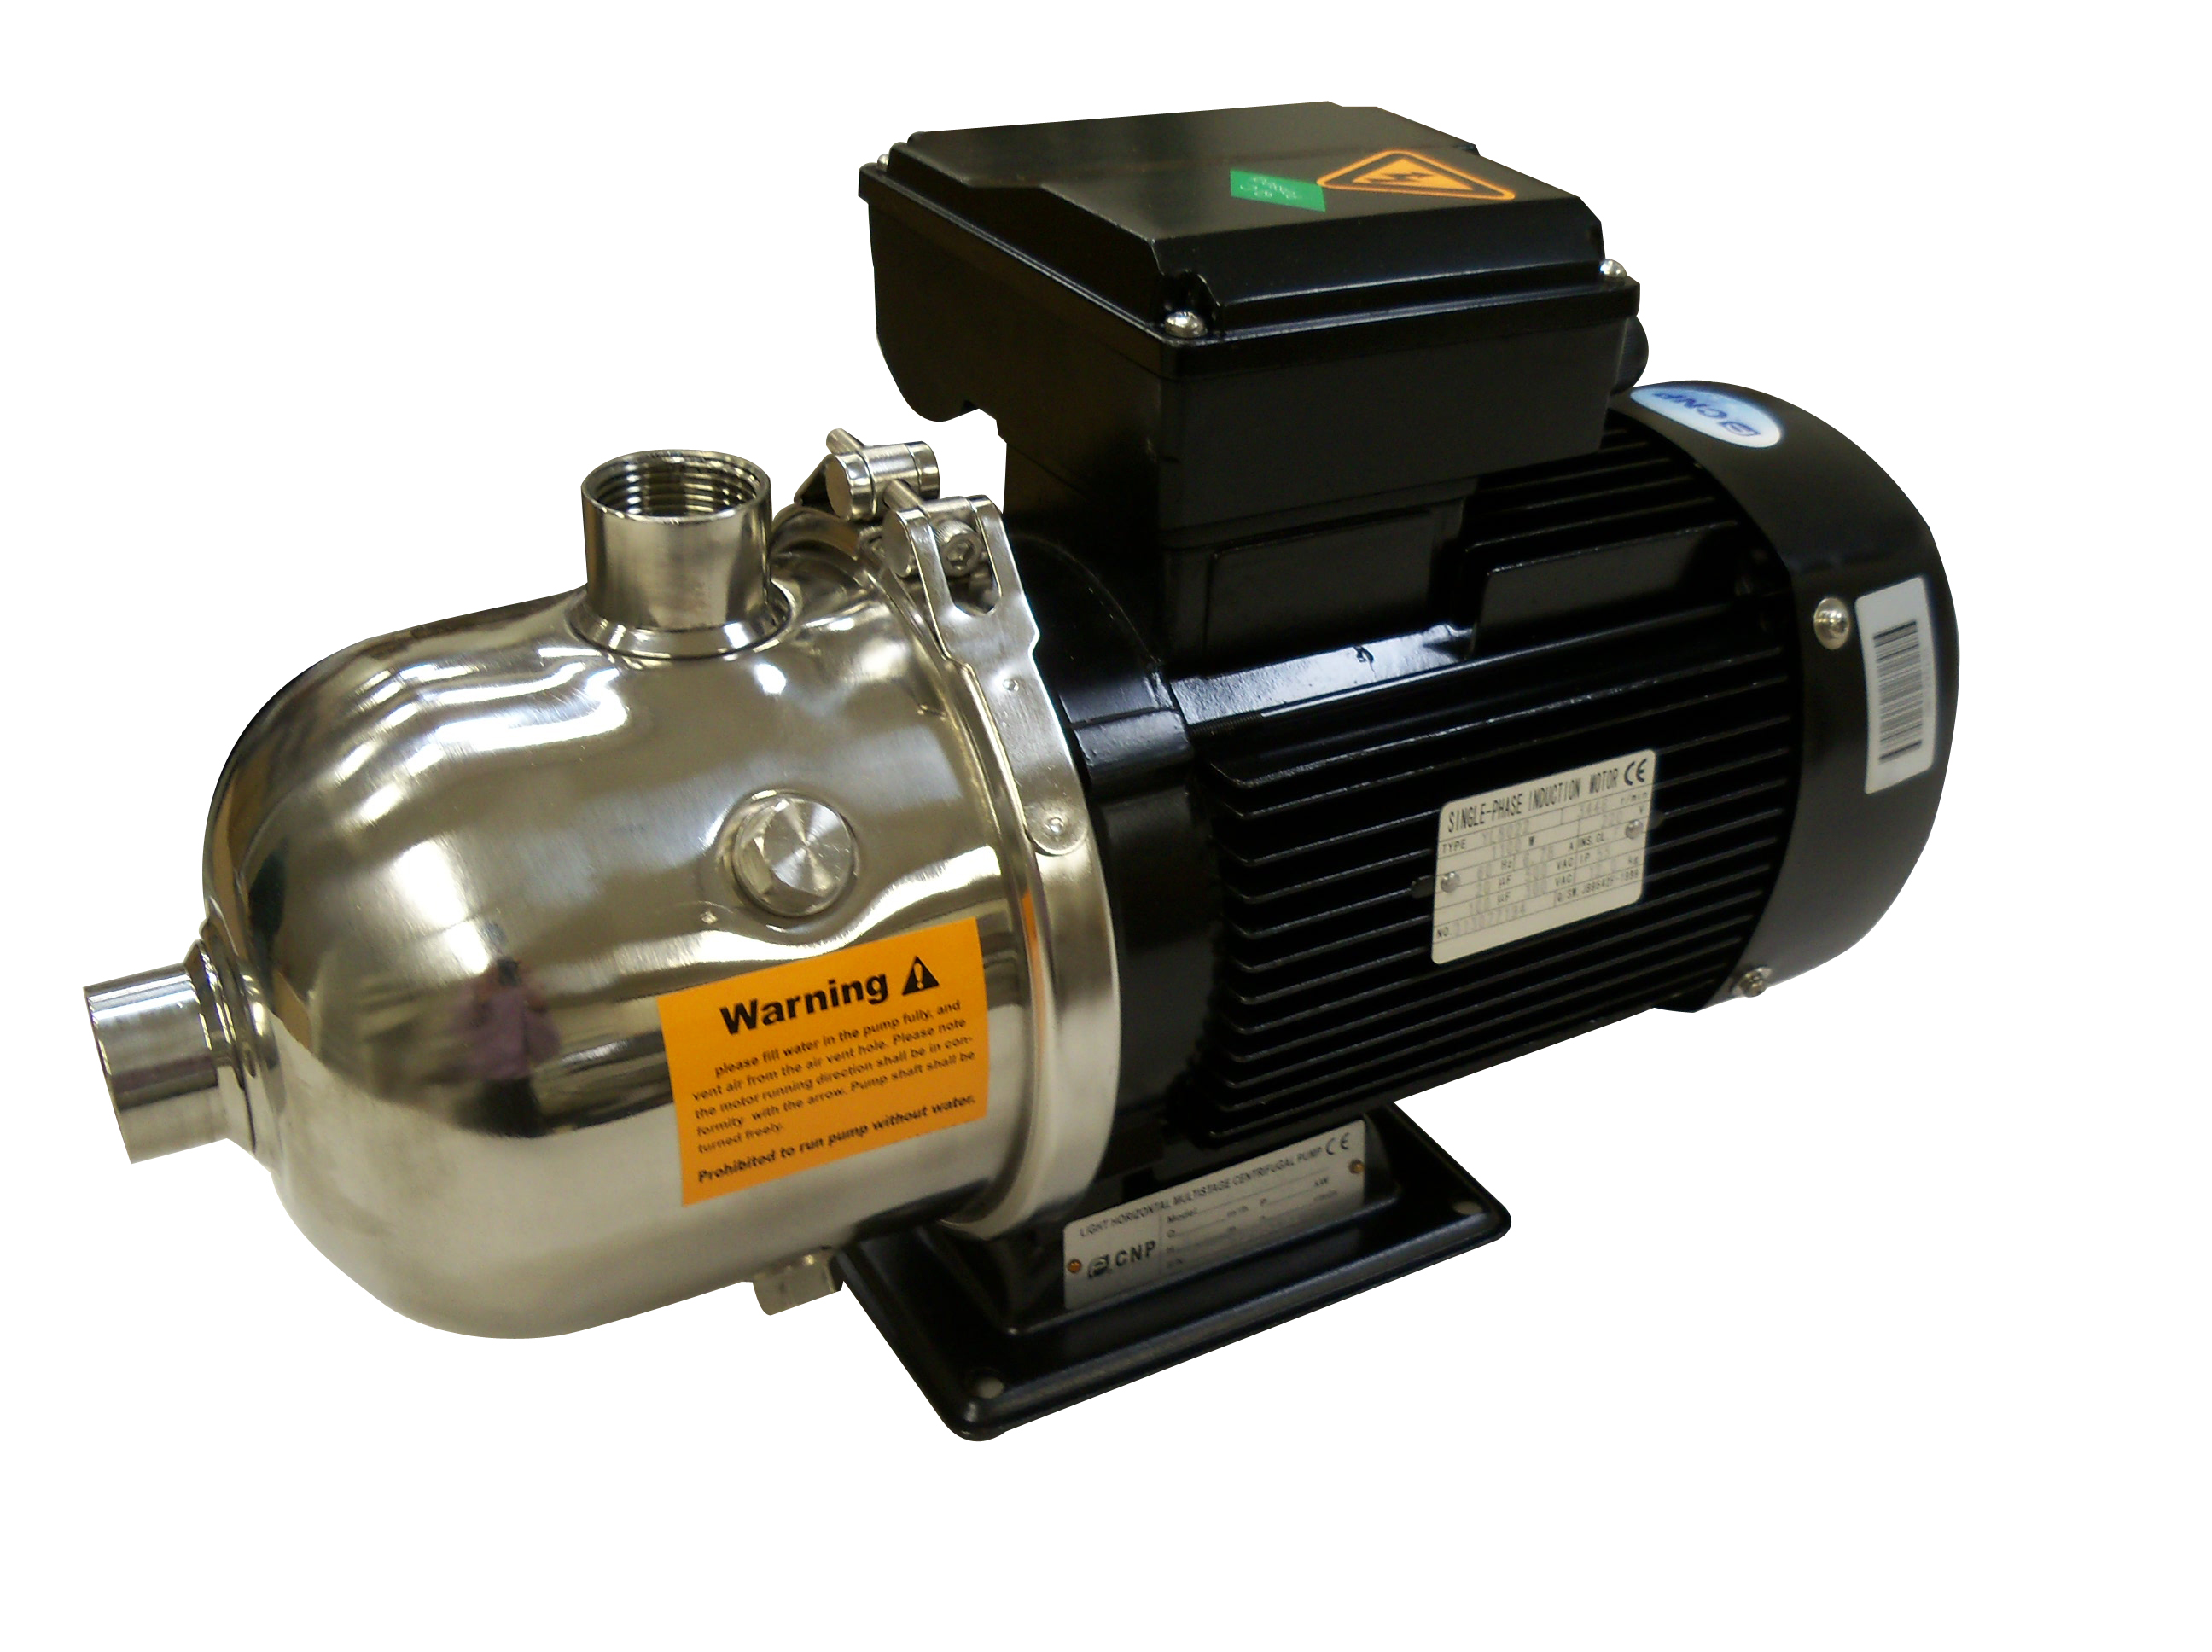 All Stars Pump Booster Test pumps booster|stainless steel booster pump 1.0 hp 220v 60hz